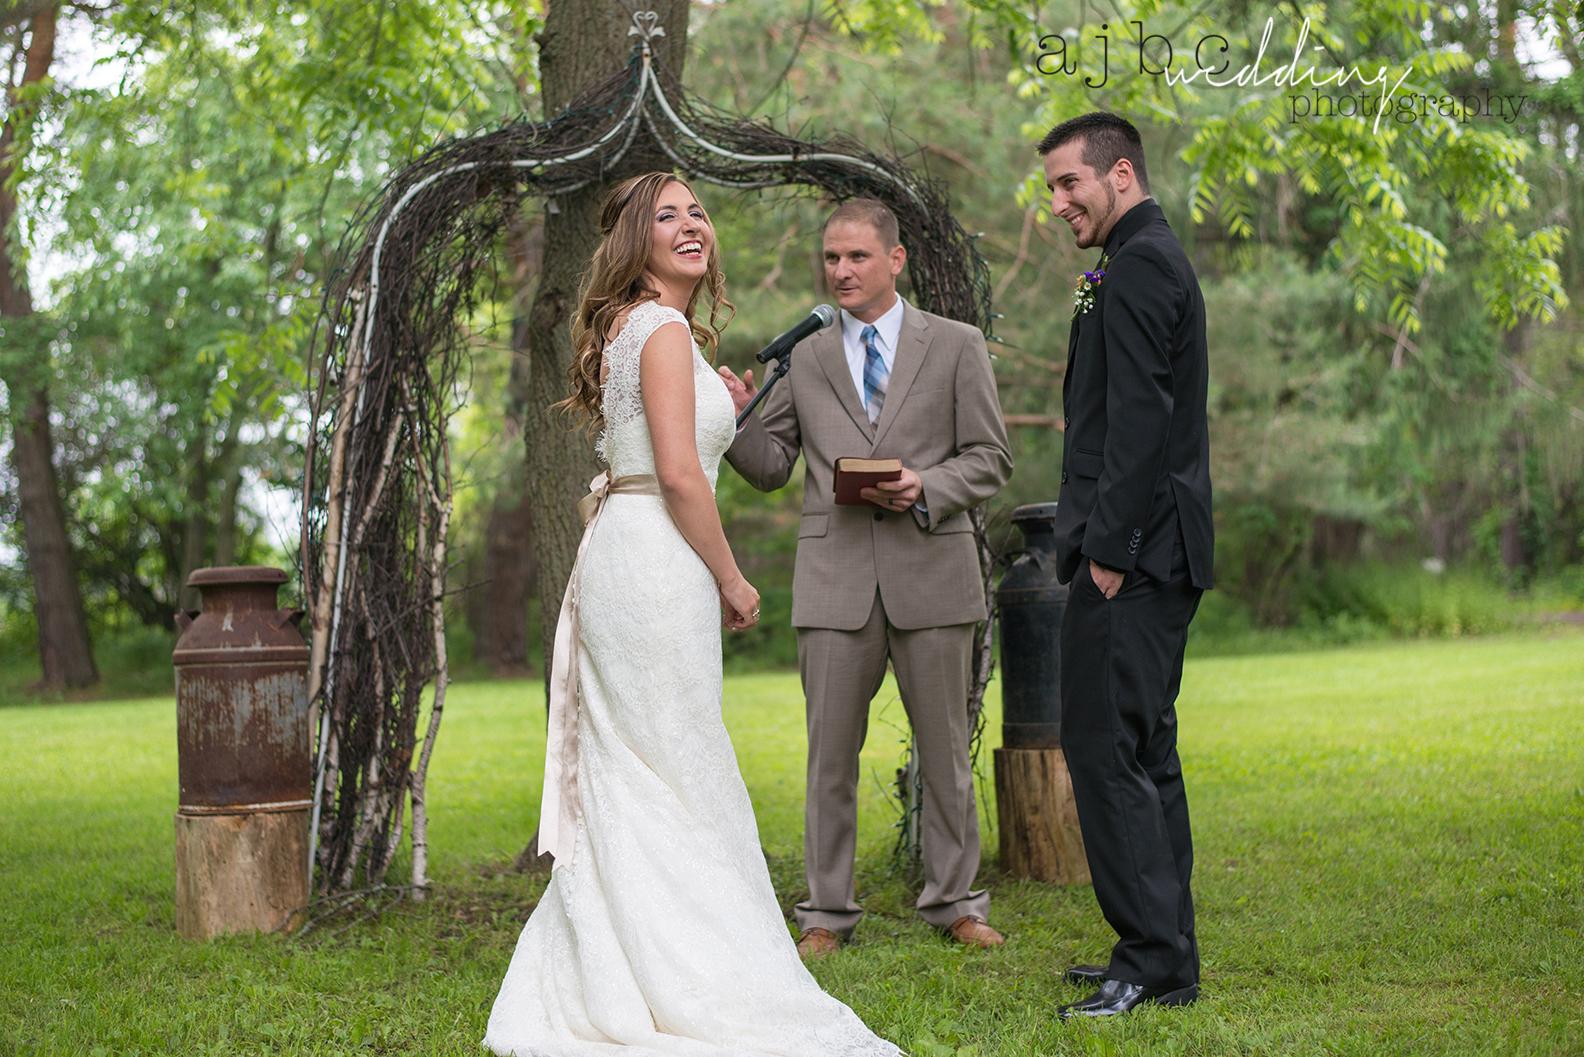 ajbcphotography-port-huron-michigan-wedding-photographer-outdoors-summer-wedding-country-wedding-wadhams-michigan-bride-groom-love-vintage-wedding-ceremony.jpg